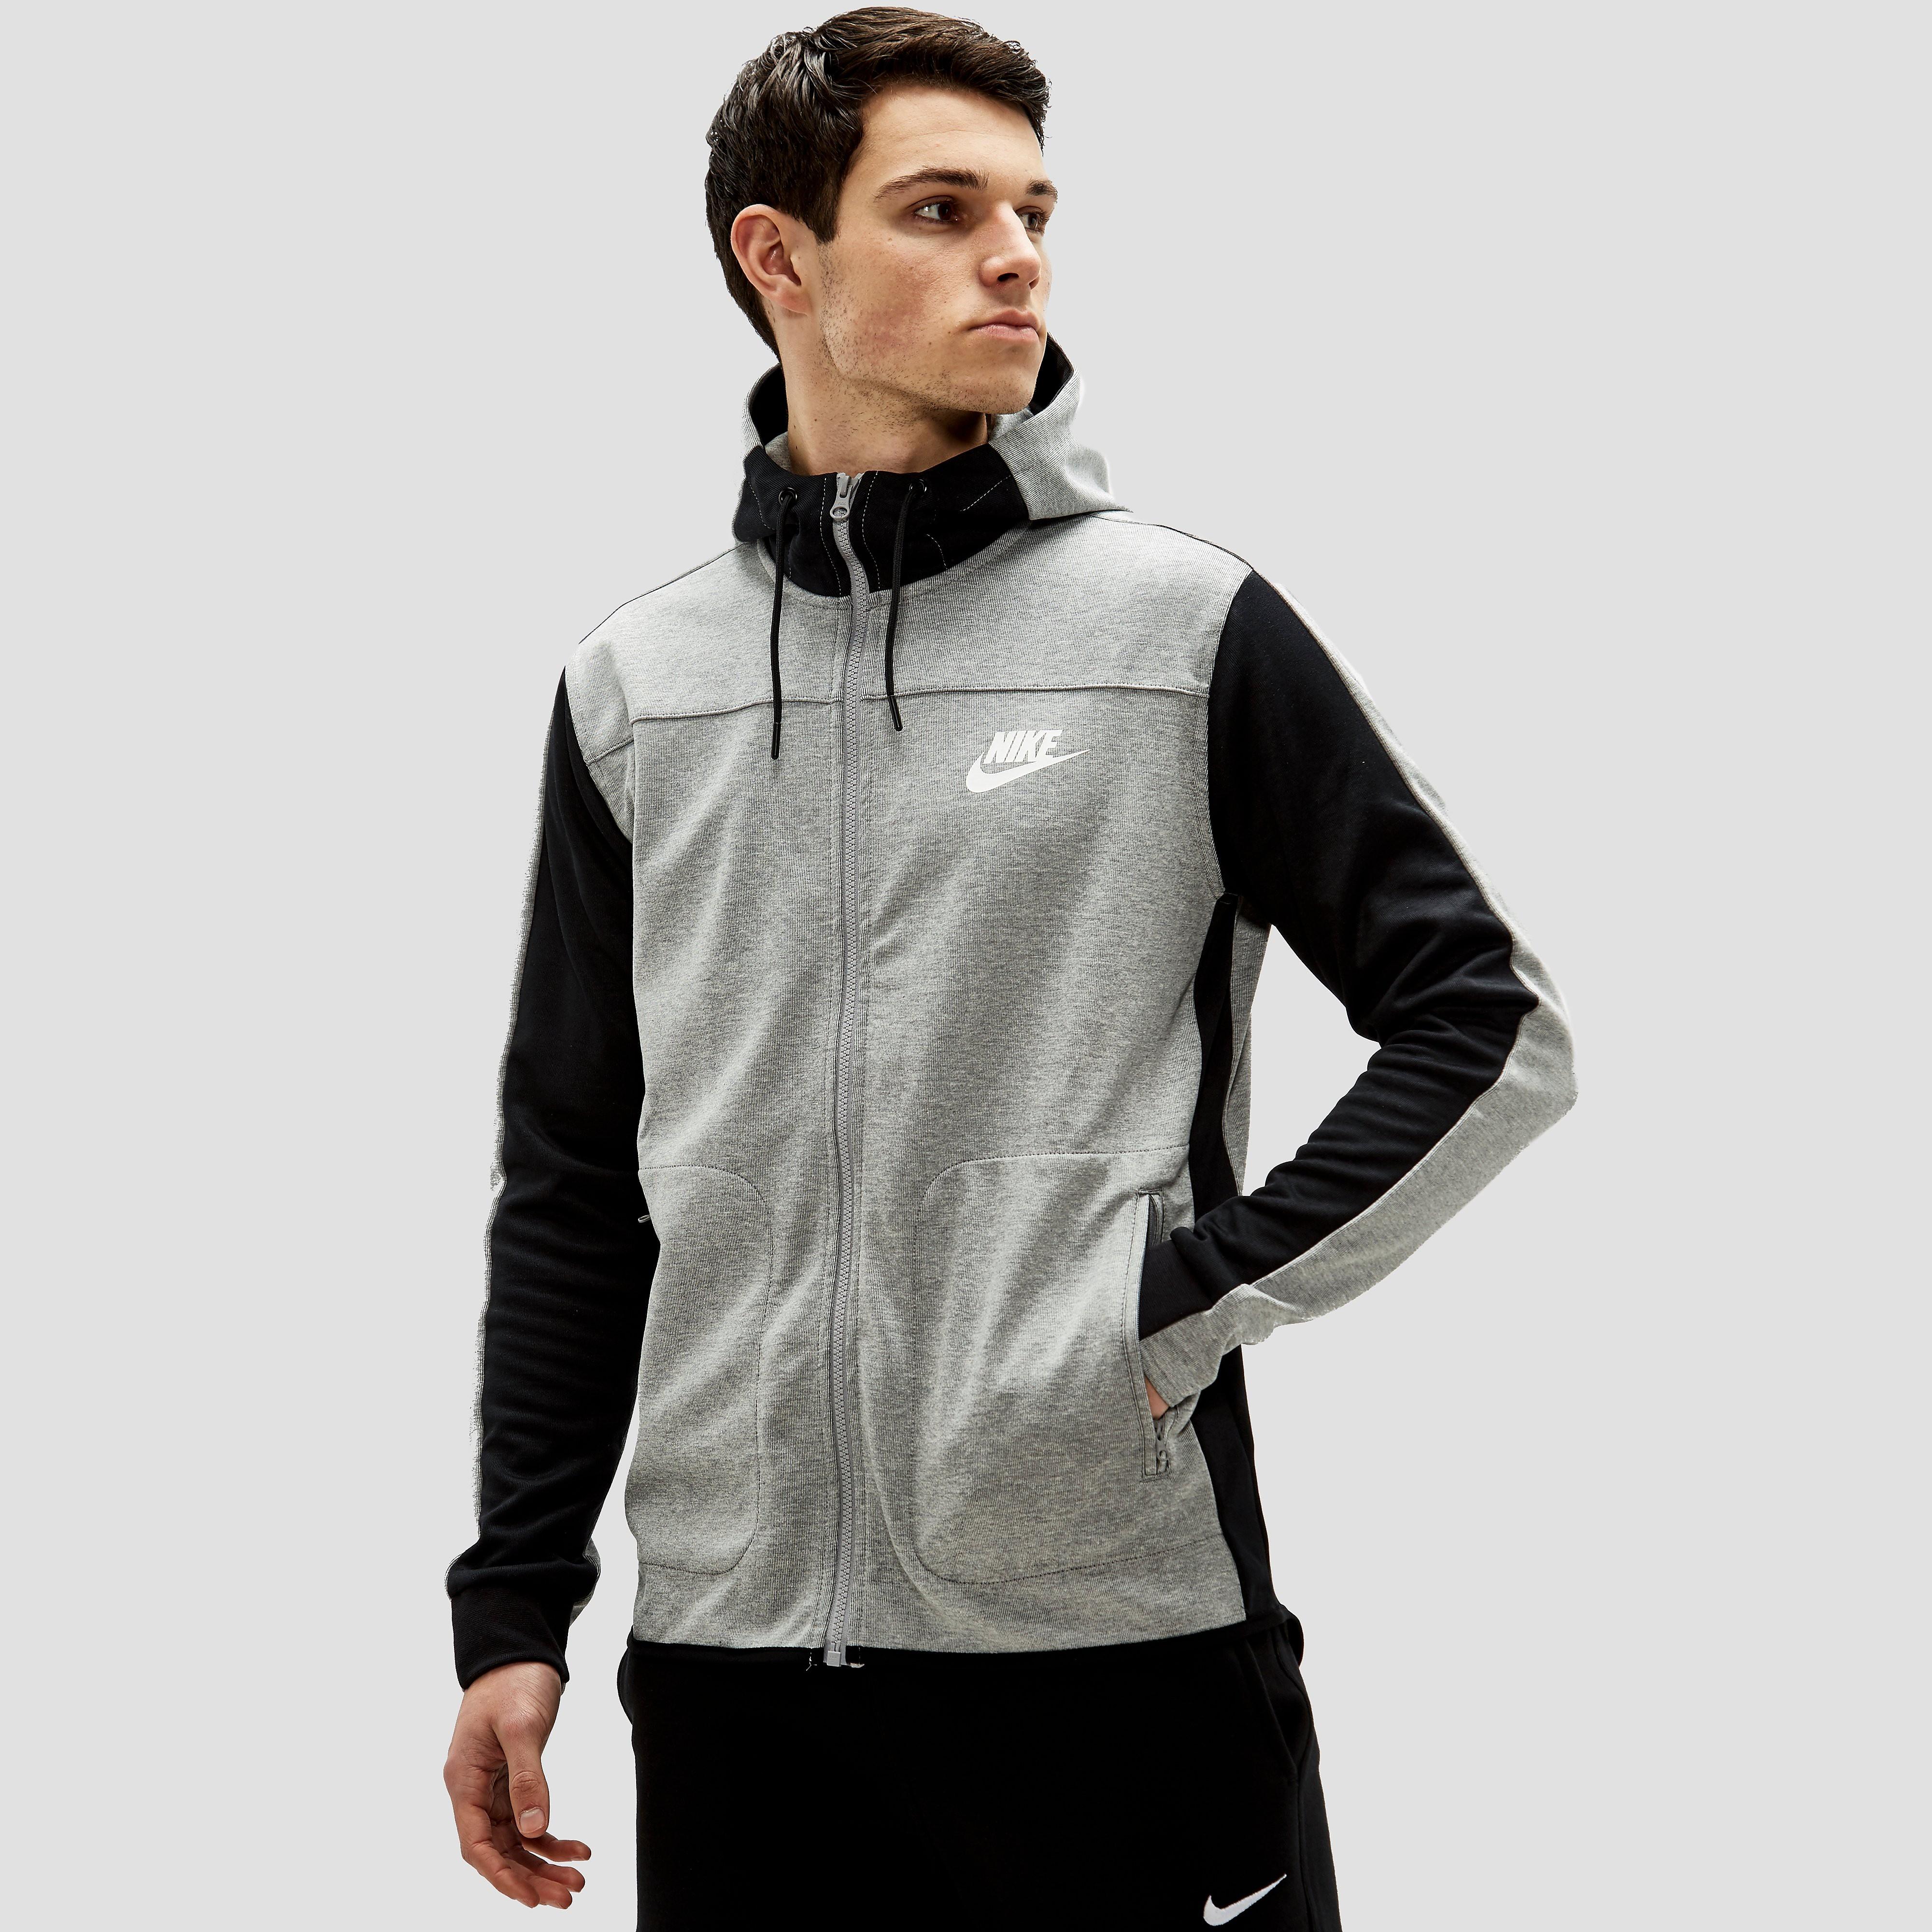 Nike SPORTSWEAR AV15 VEST